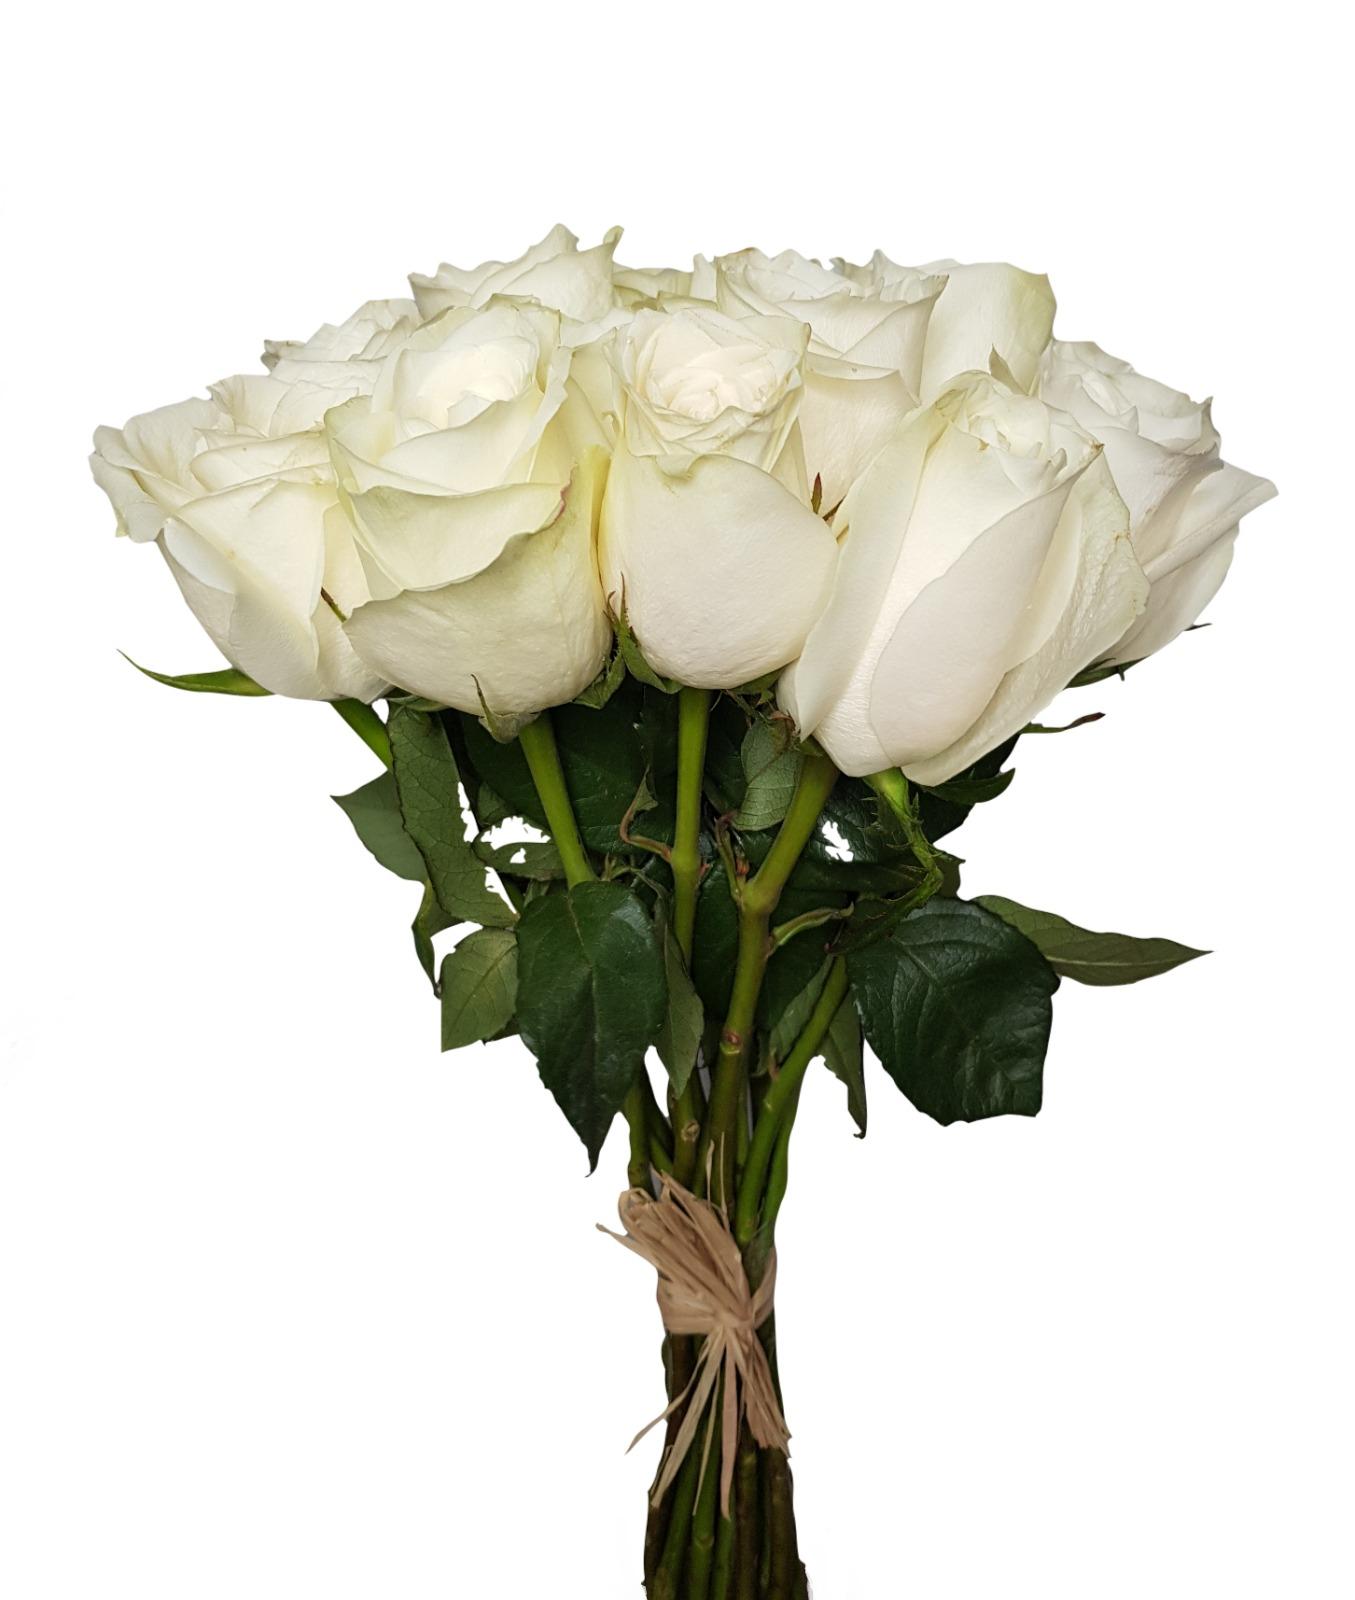 Rose - White 'Wholesale Flowers'